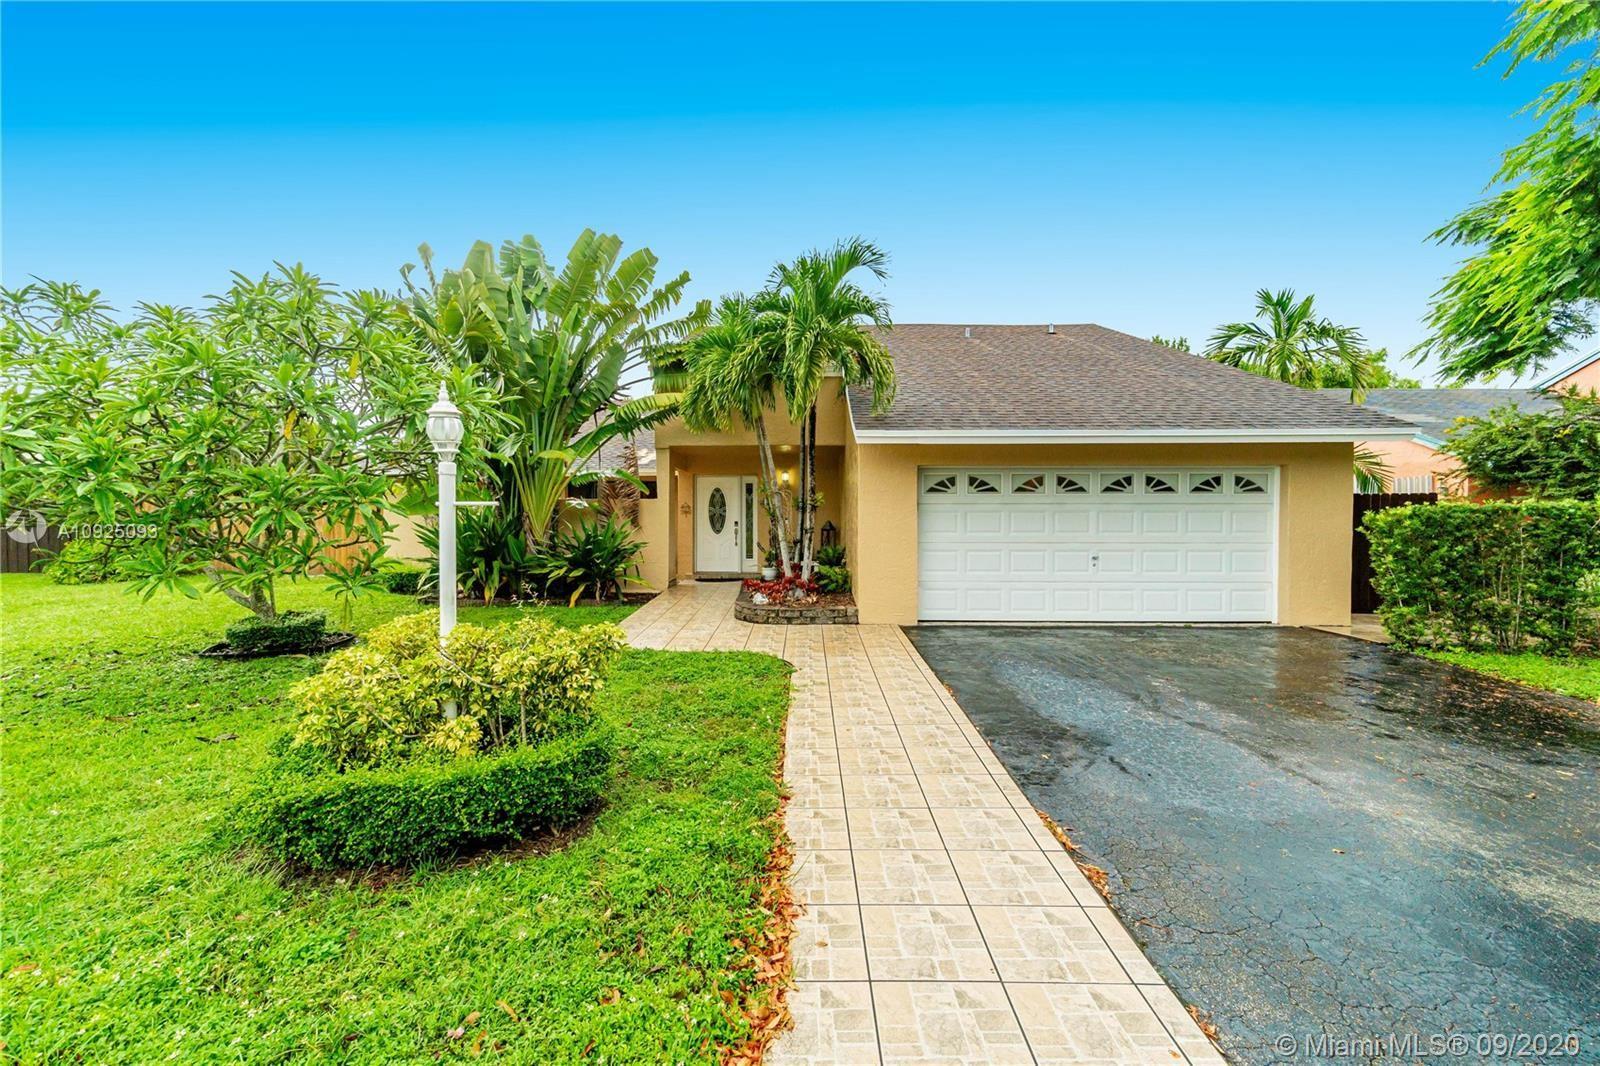 12241 SW 93rd St, Miami, FL 33186 - #: A10925093